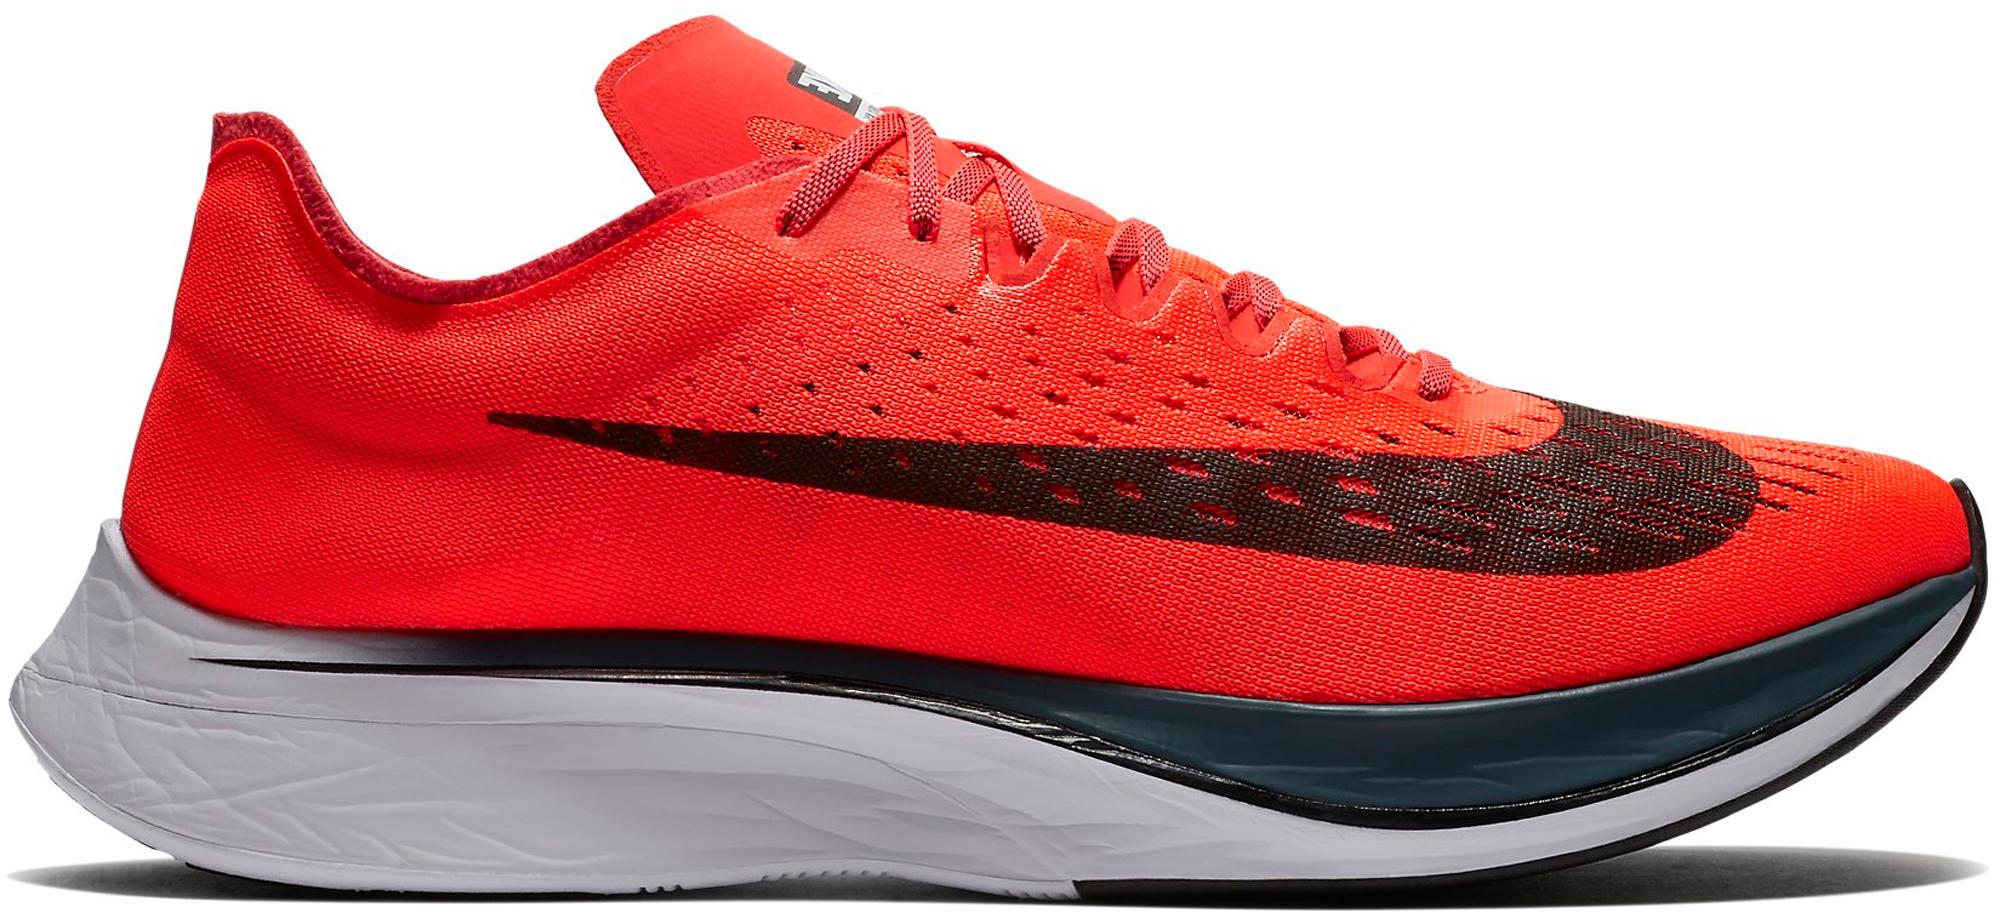 Nike Zoom Vaporfly 4% Bright Crimson